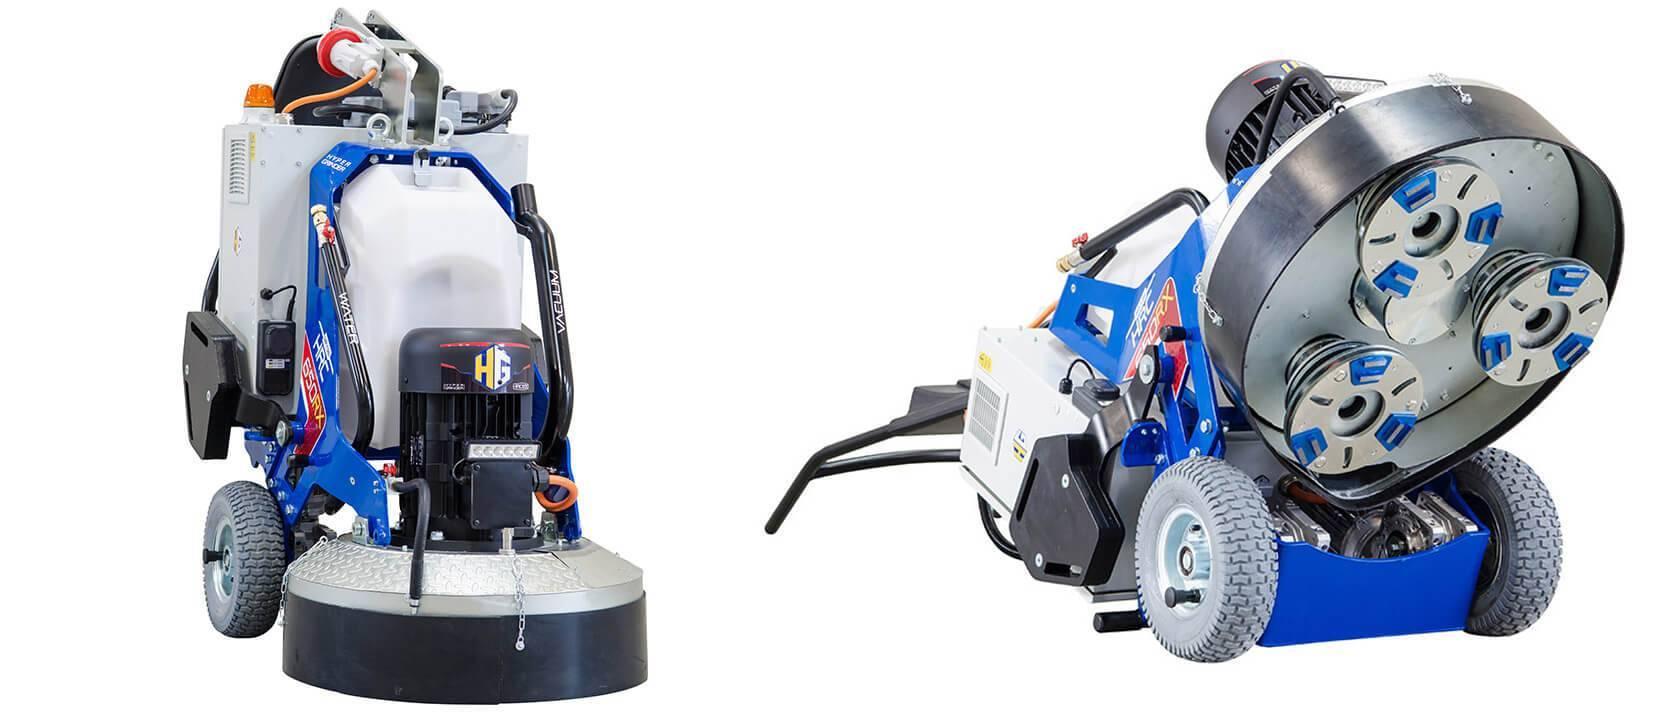 منتج منزلق HRC 650 RX 1